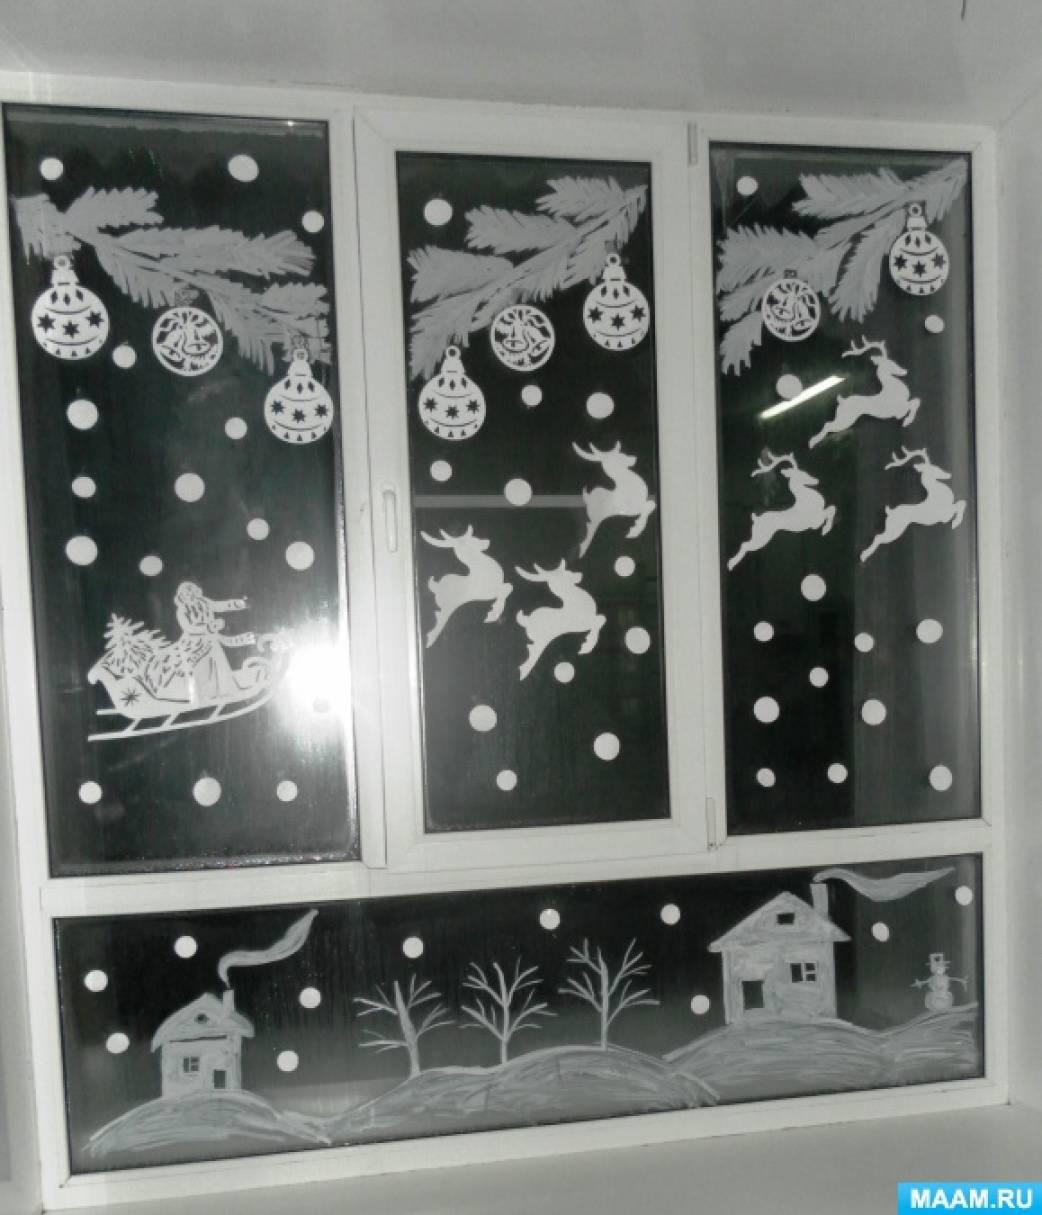 Оформление окон и стен в группе «Зимняя сказка»